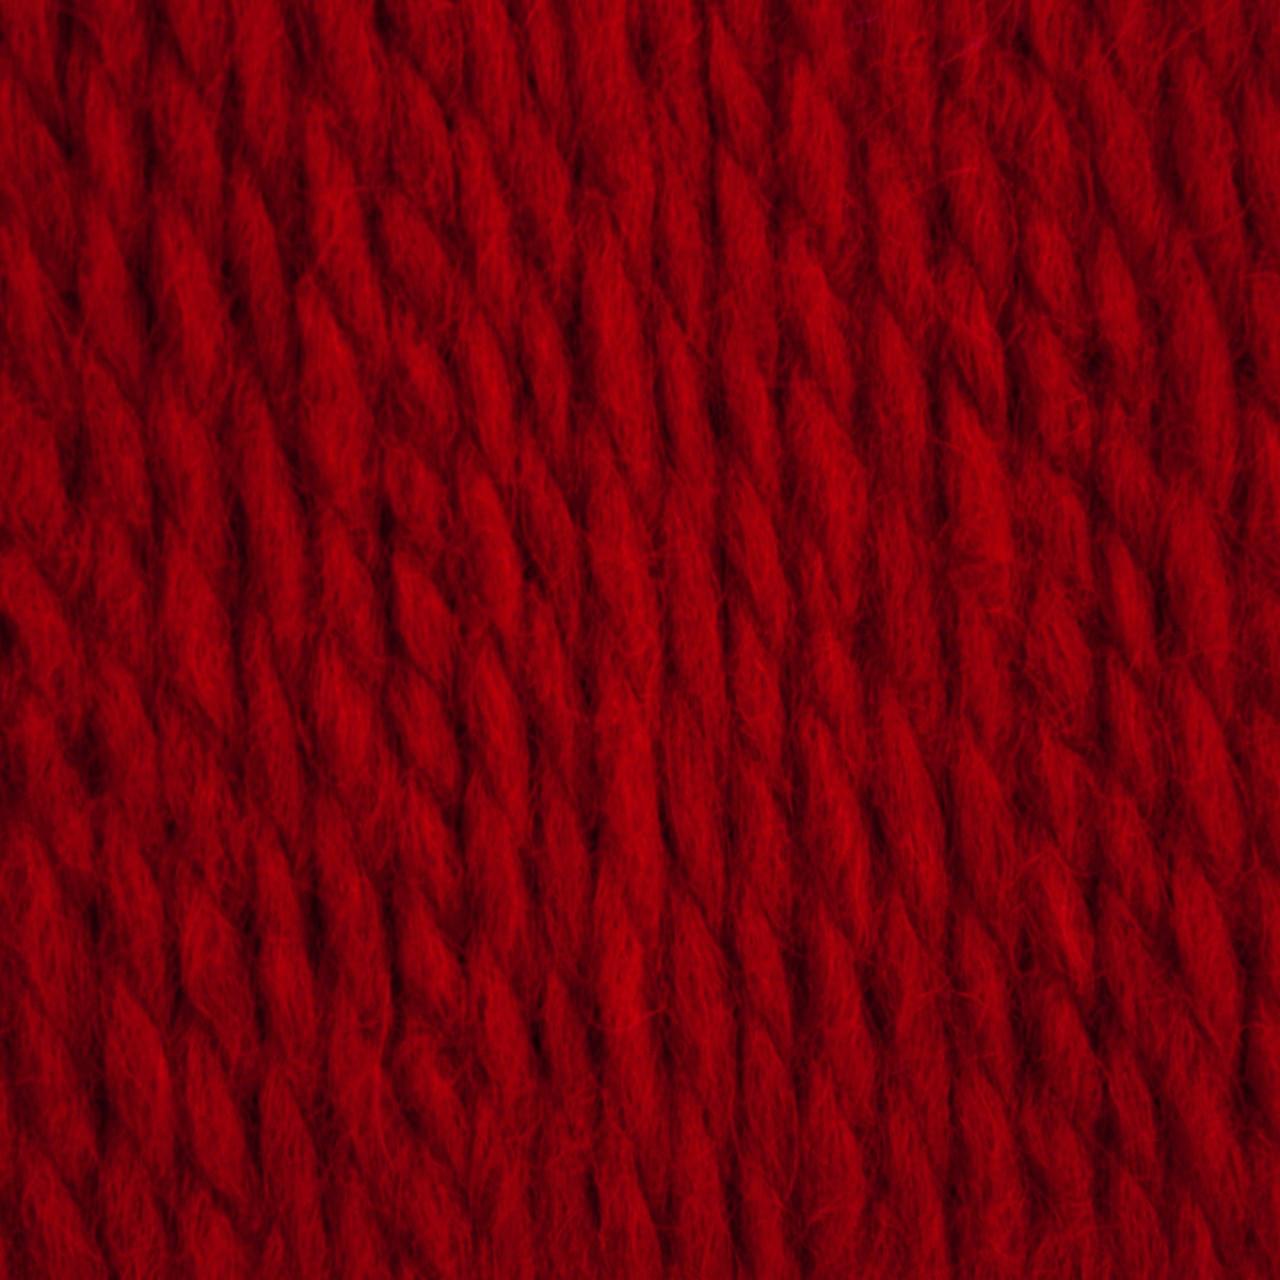 Patons Red Robin Shetland Chunky Yarn (5 - Bulky), Free